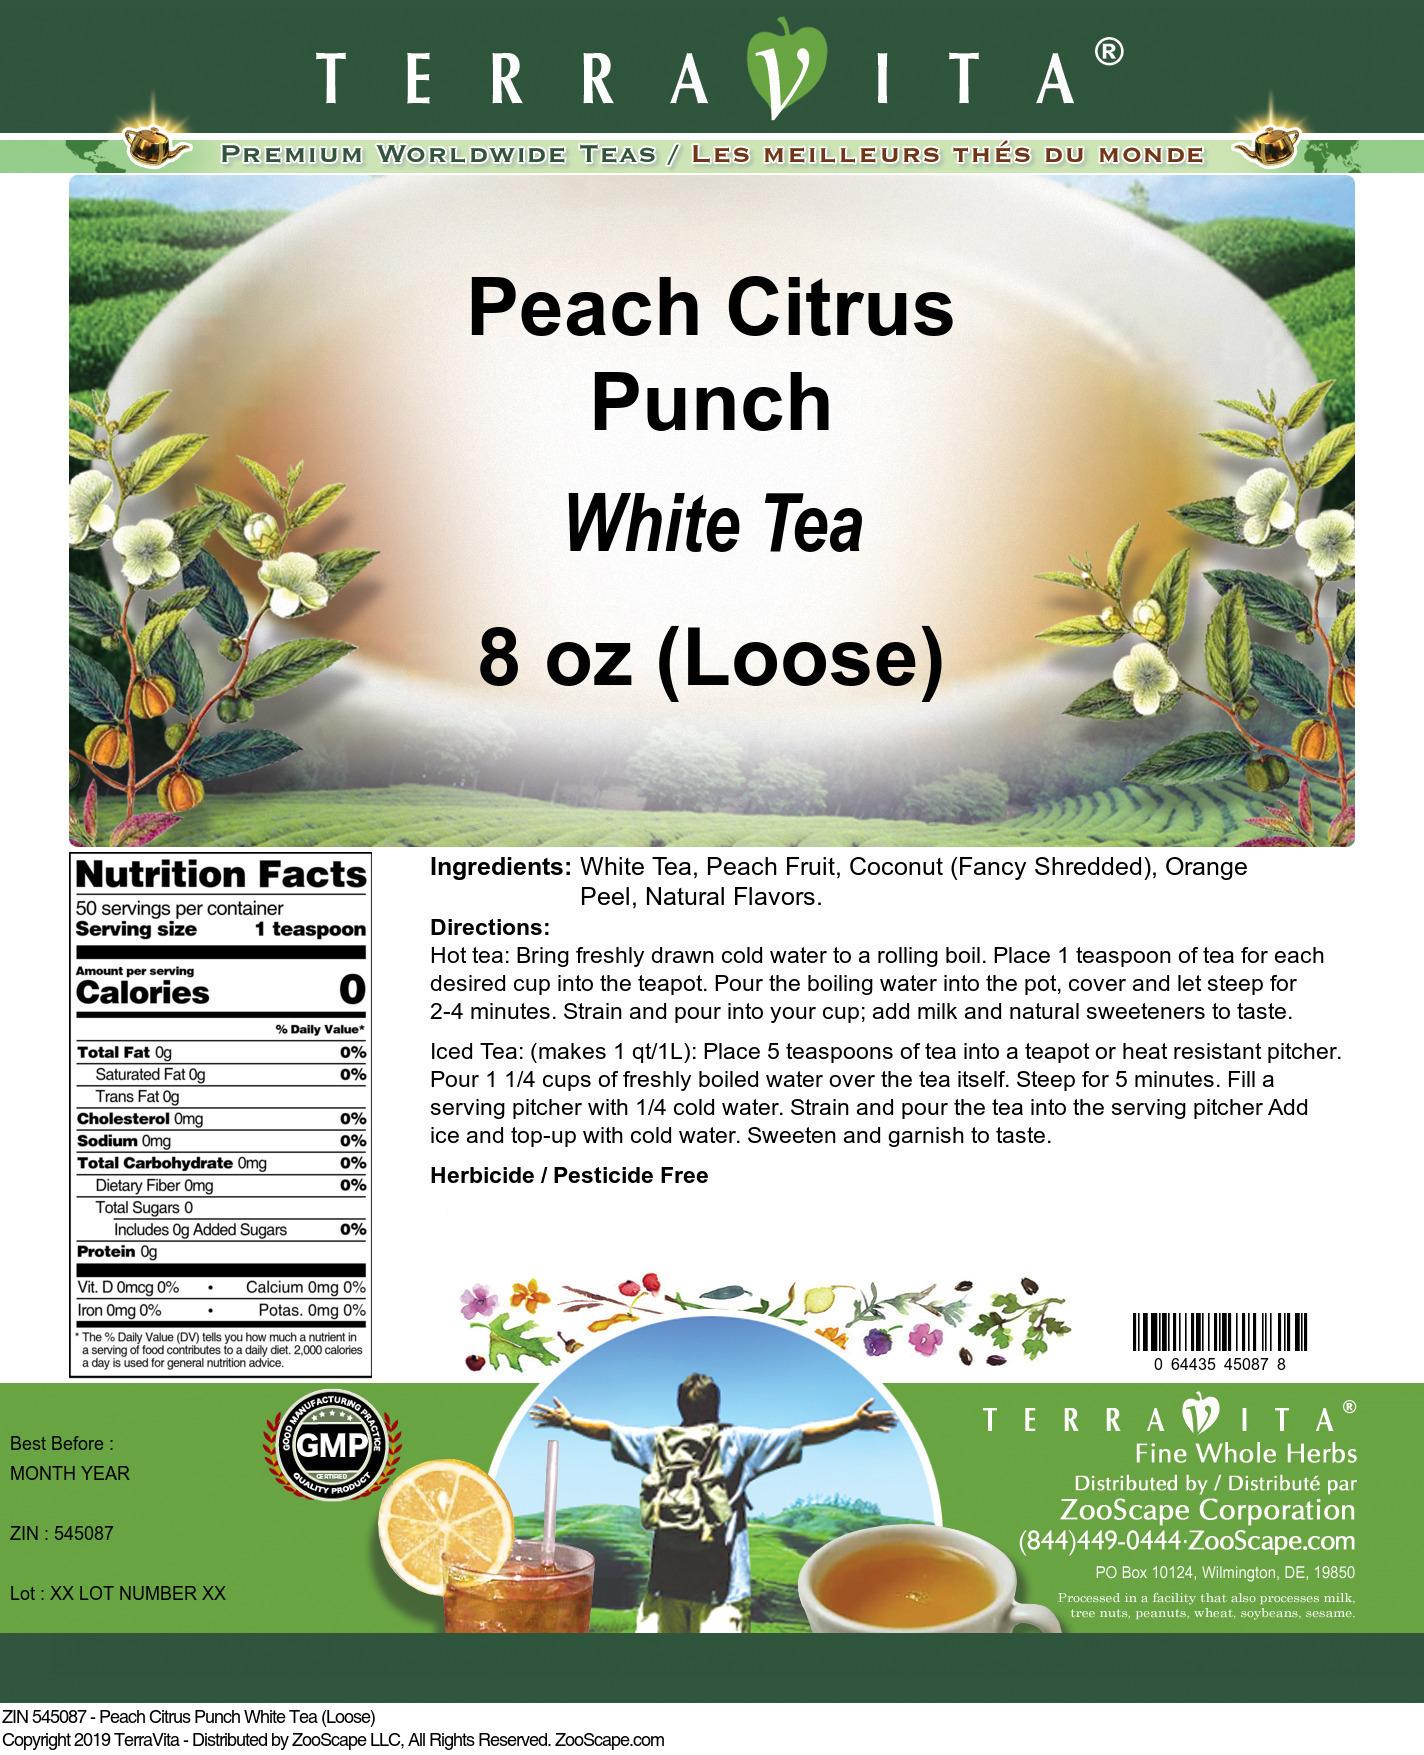 Peach Citrus Punch White Tea (Loose)